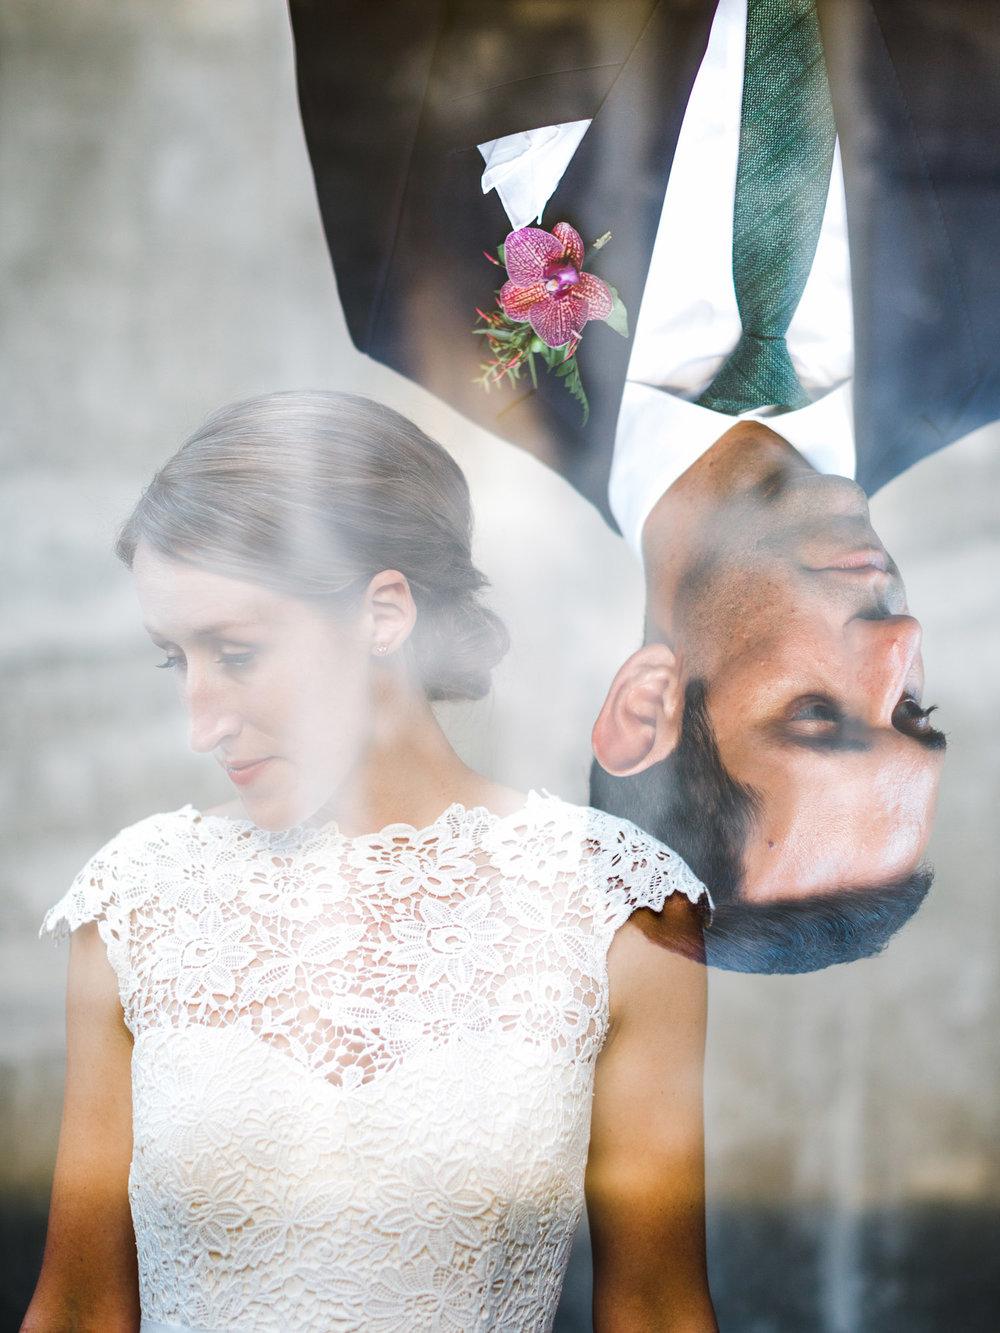 Seattle Modern Bride and Groom Double Exposure Wedding Photography.jpg